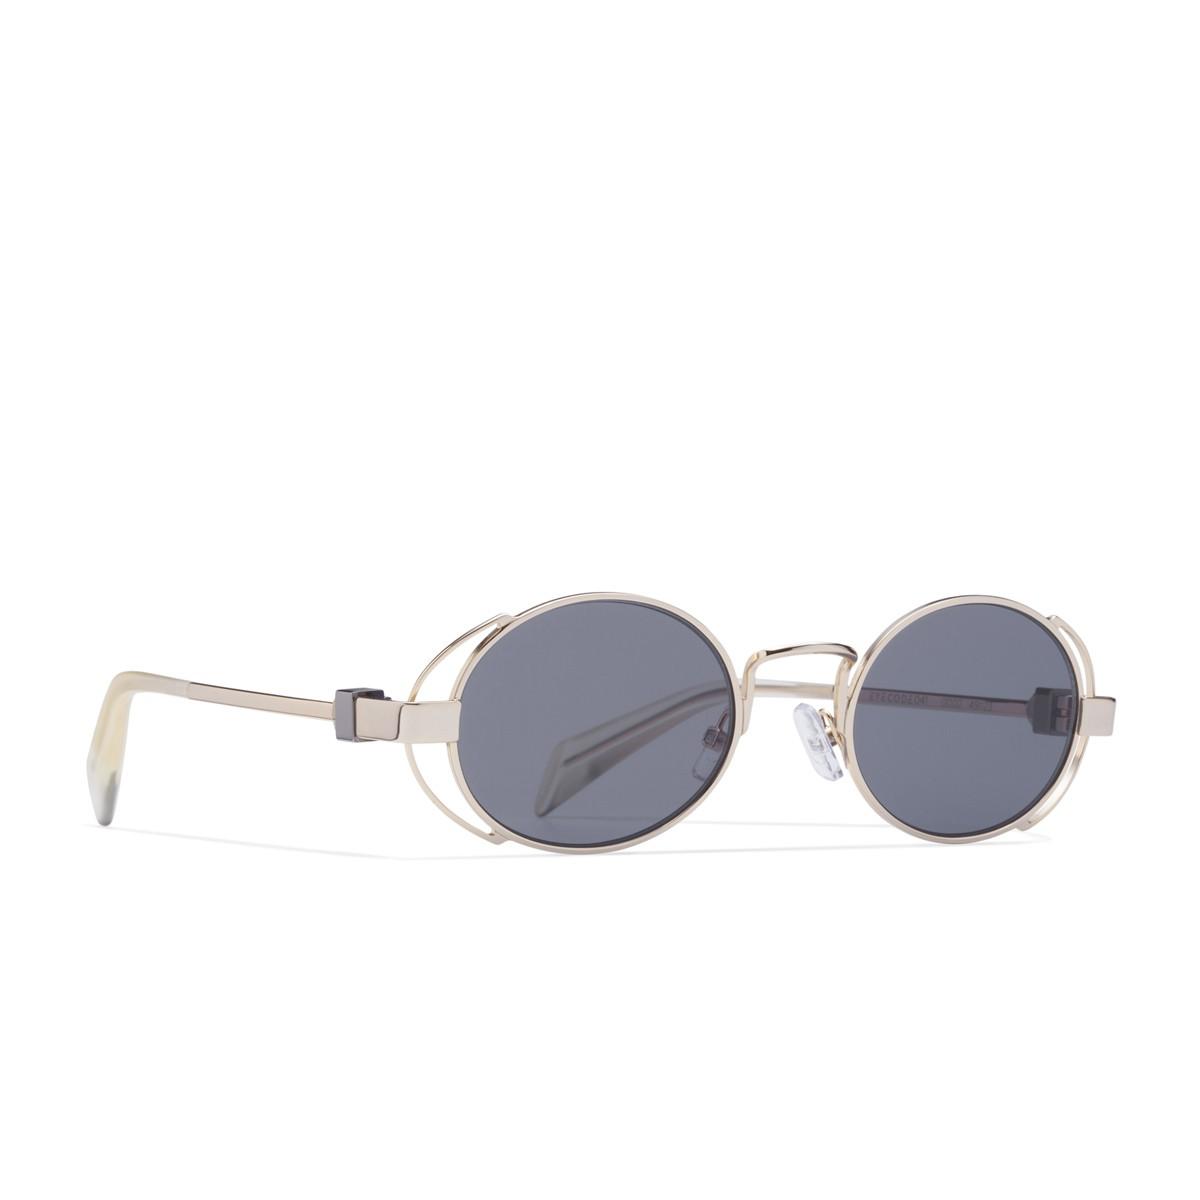 Siens Eye code 041 | Occhiali da vista Unisex